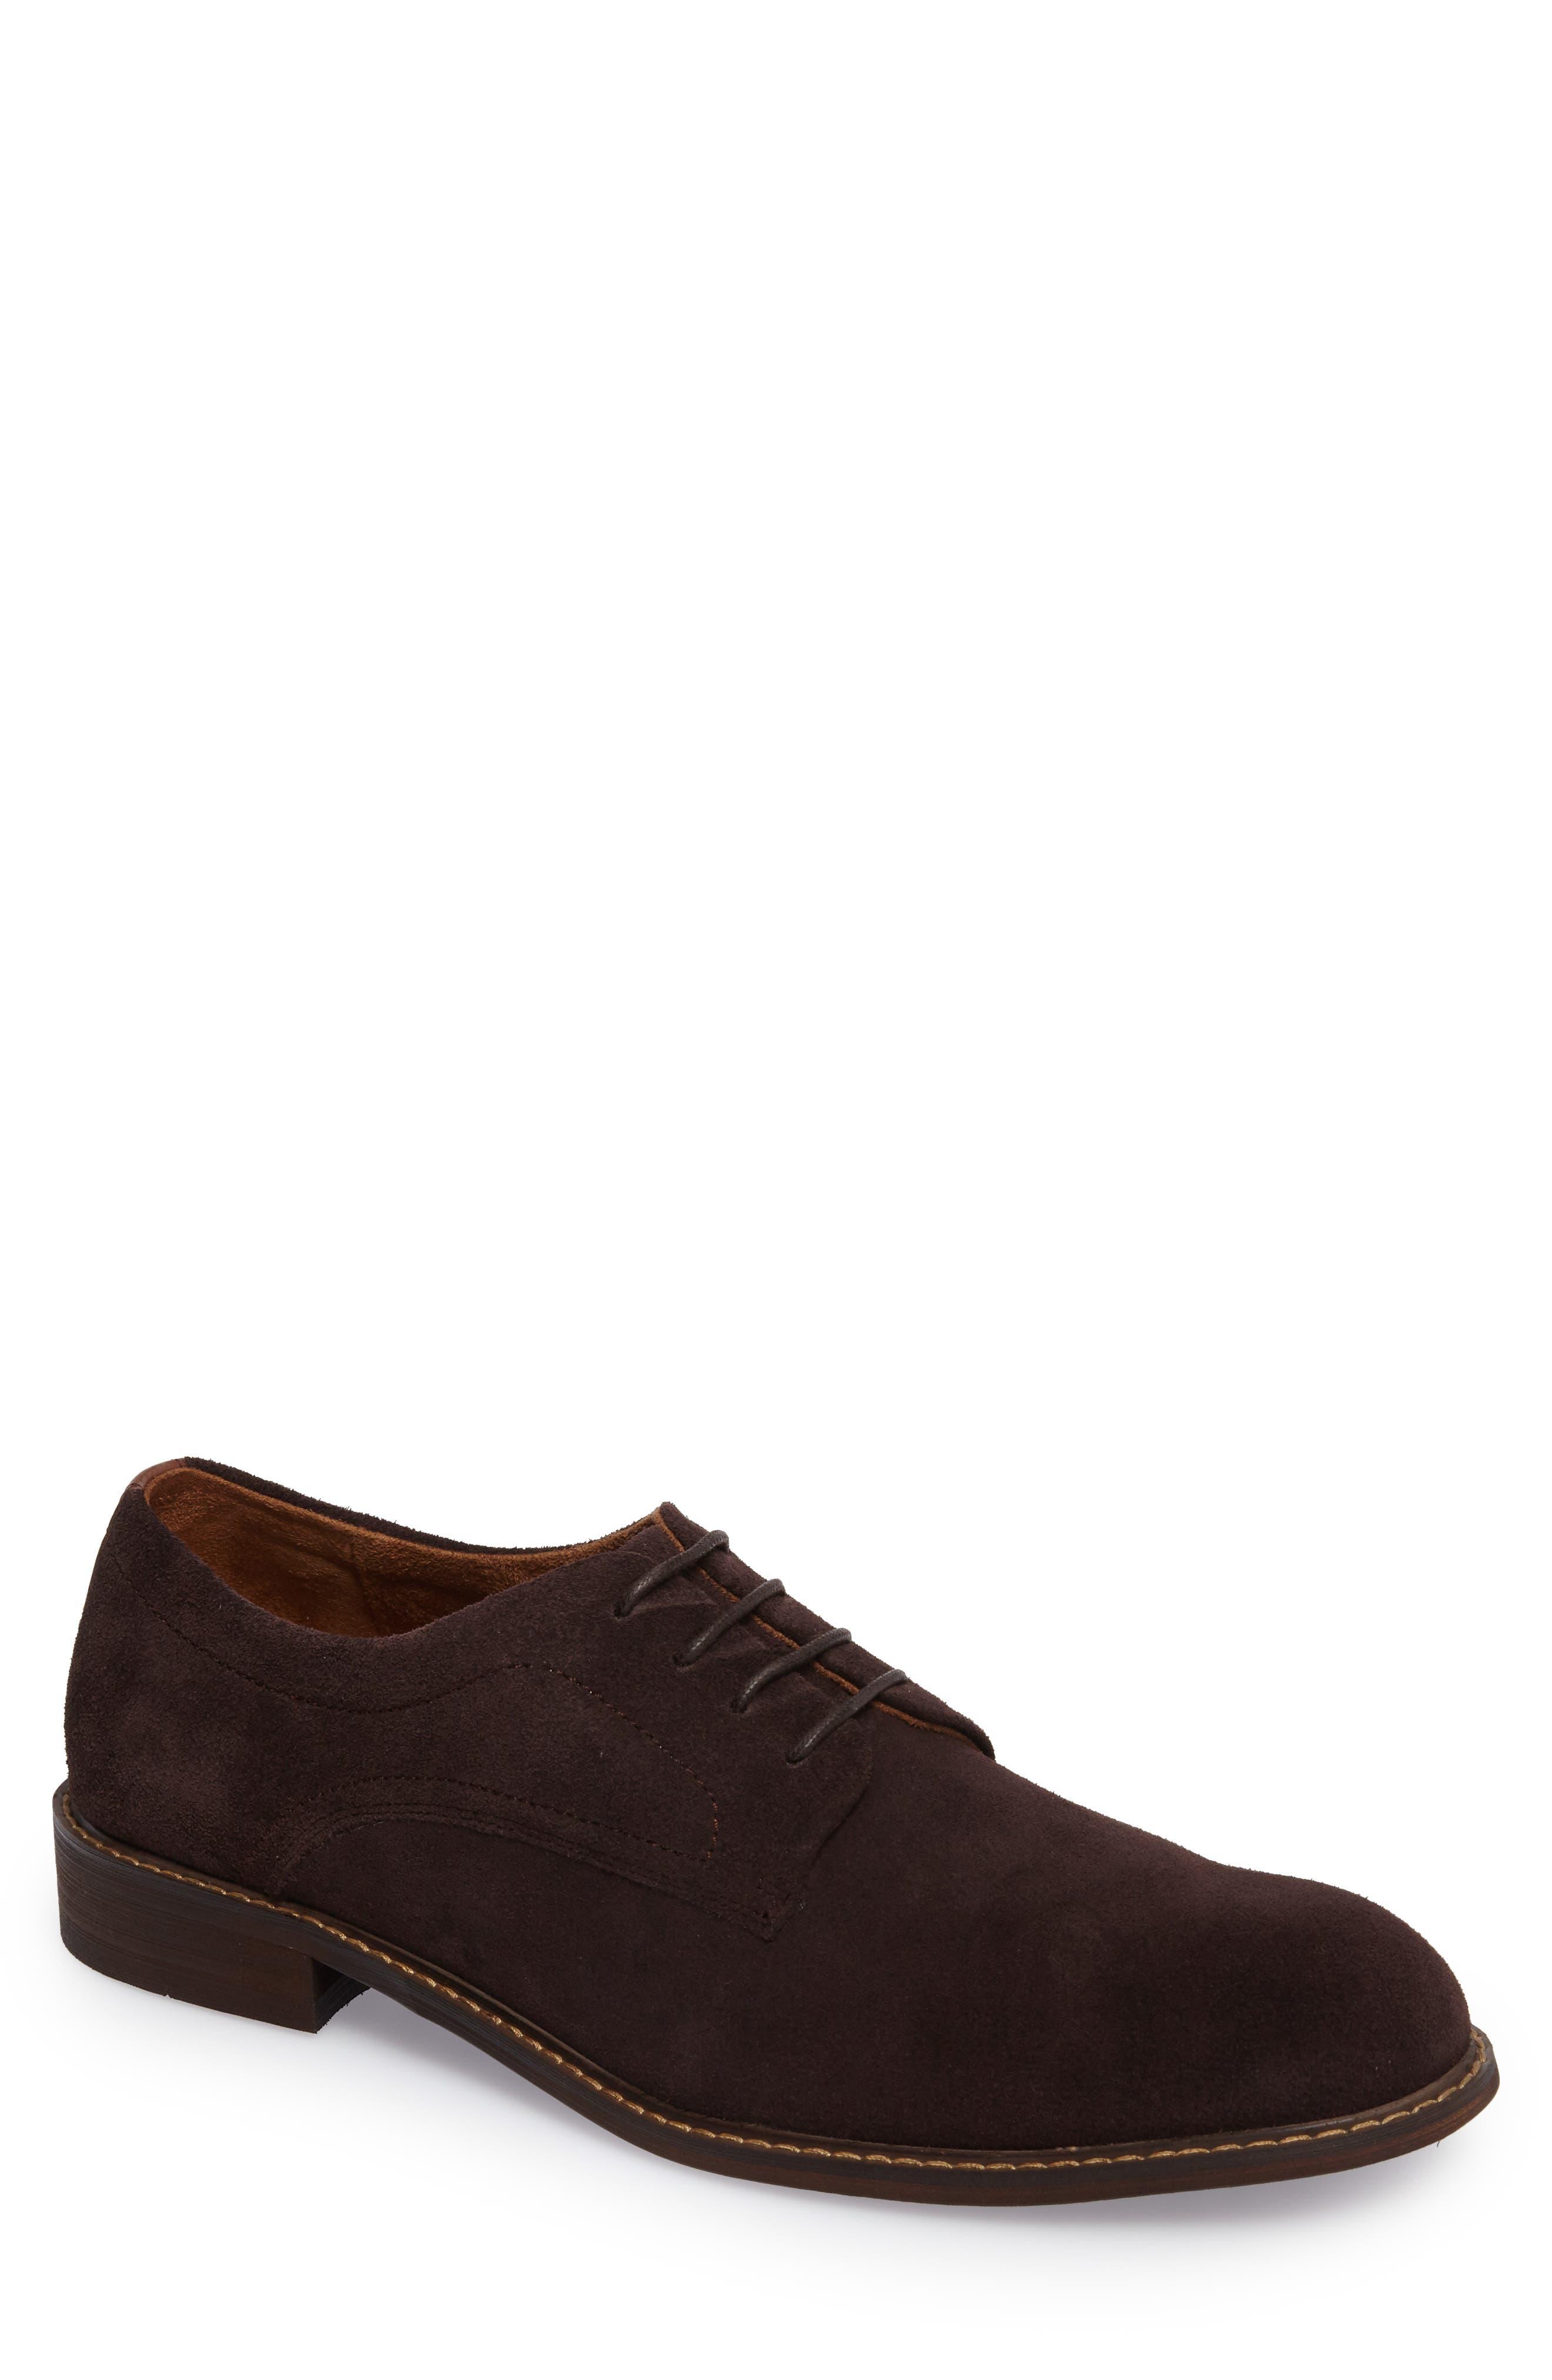 Alternate Image 1 Selected - Kenneth Cole New York Buck Shoe (Men)